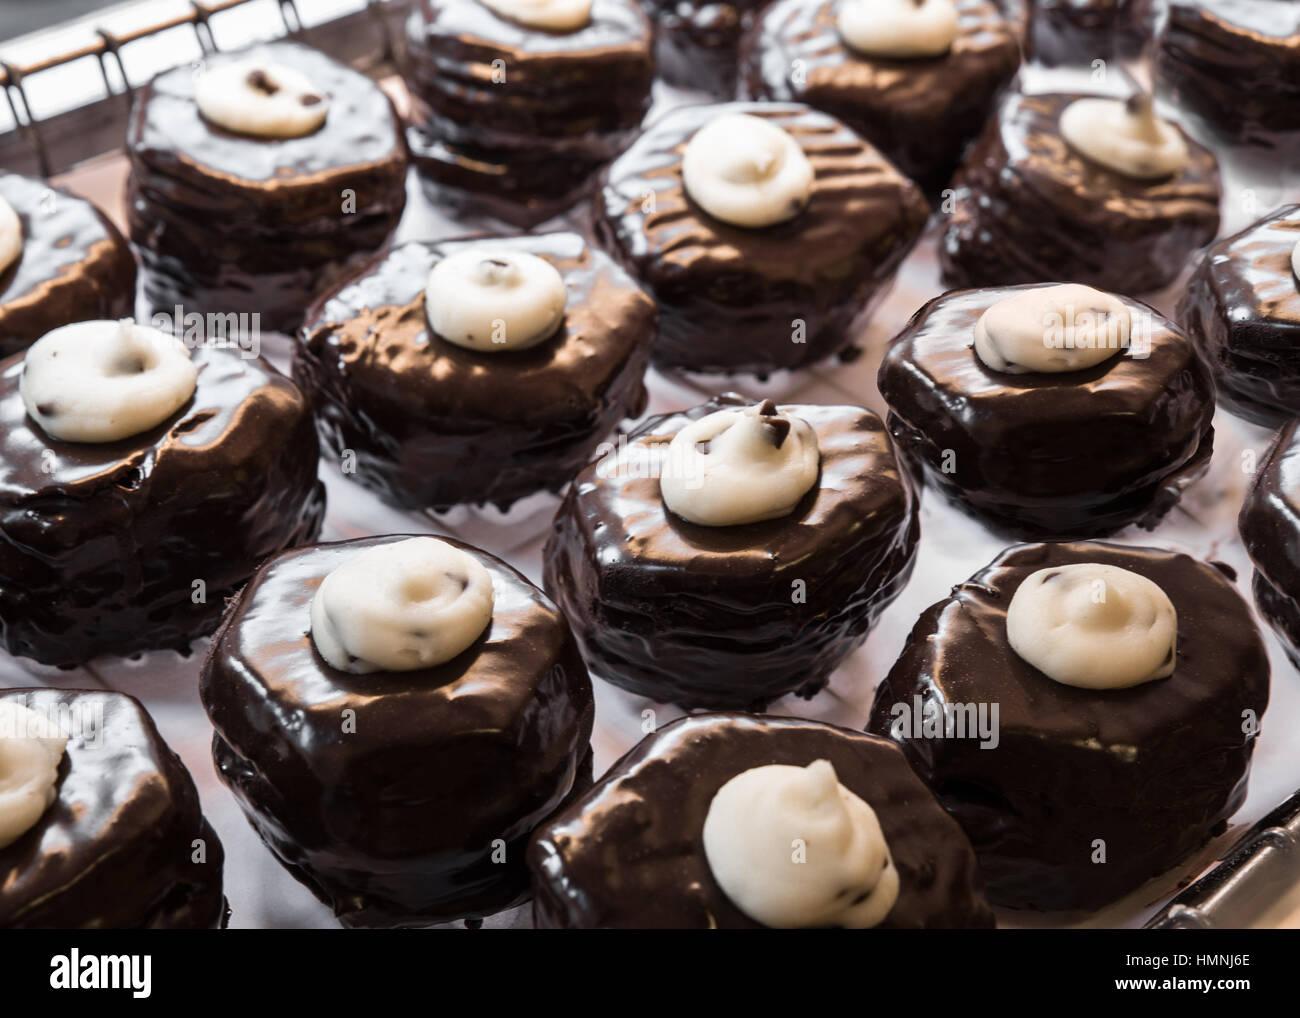 Leckere Bäckerei Display Creme gefüllt Schokolade frosted donuts Stockbild